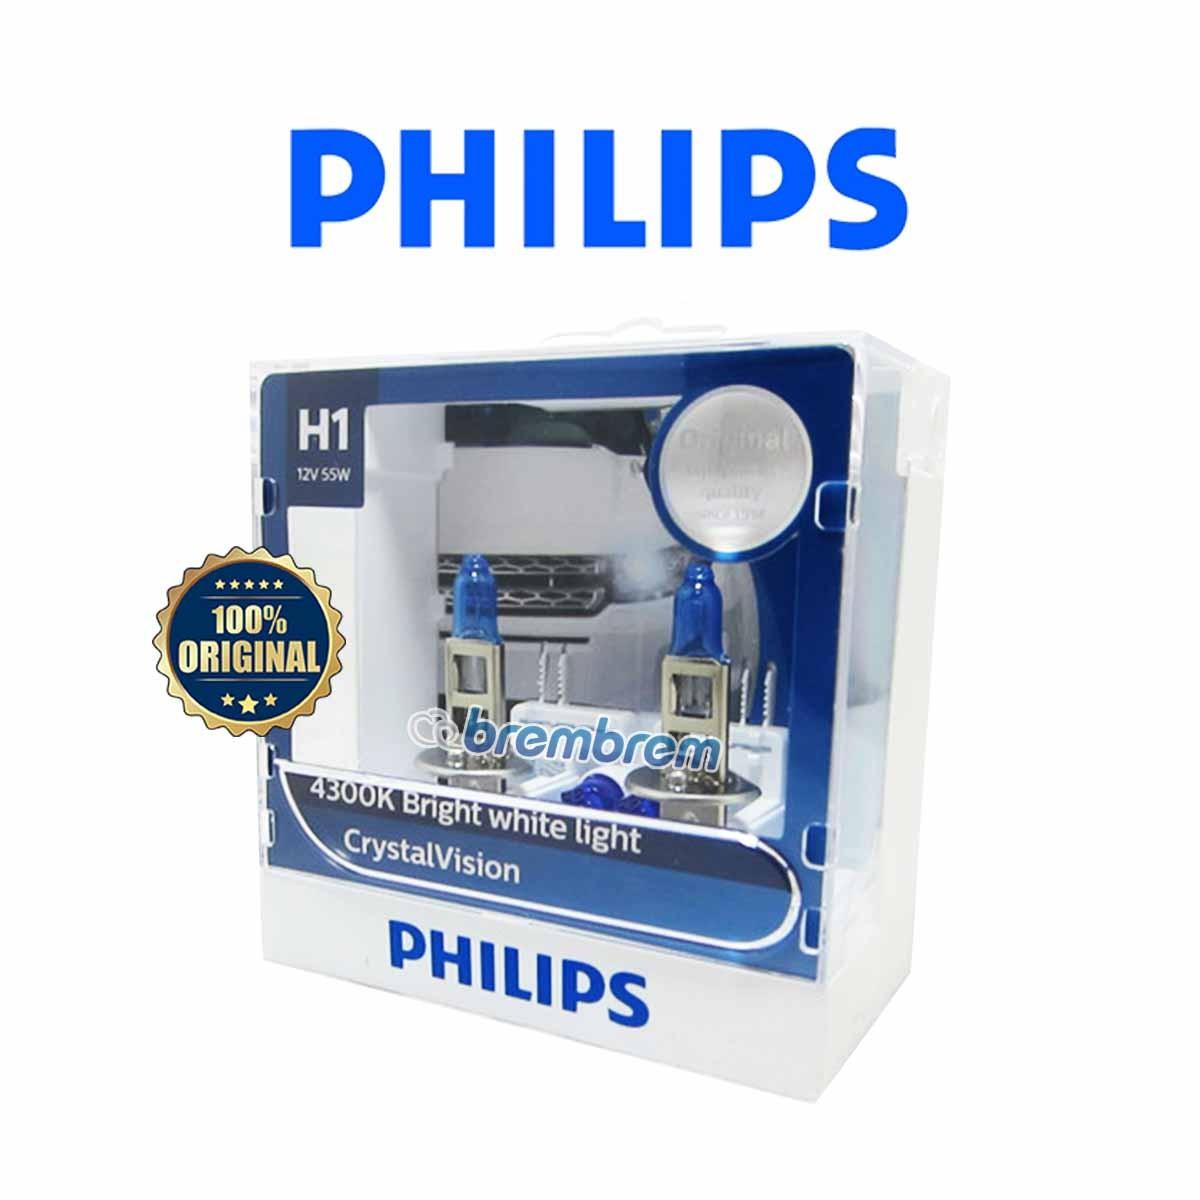 PHILIPS CRYSTAL VISION H1 (4300K) - LAMPU HALOGEN